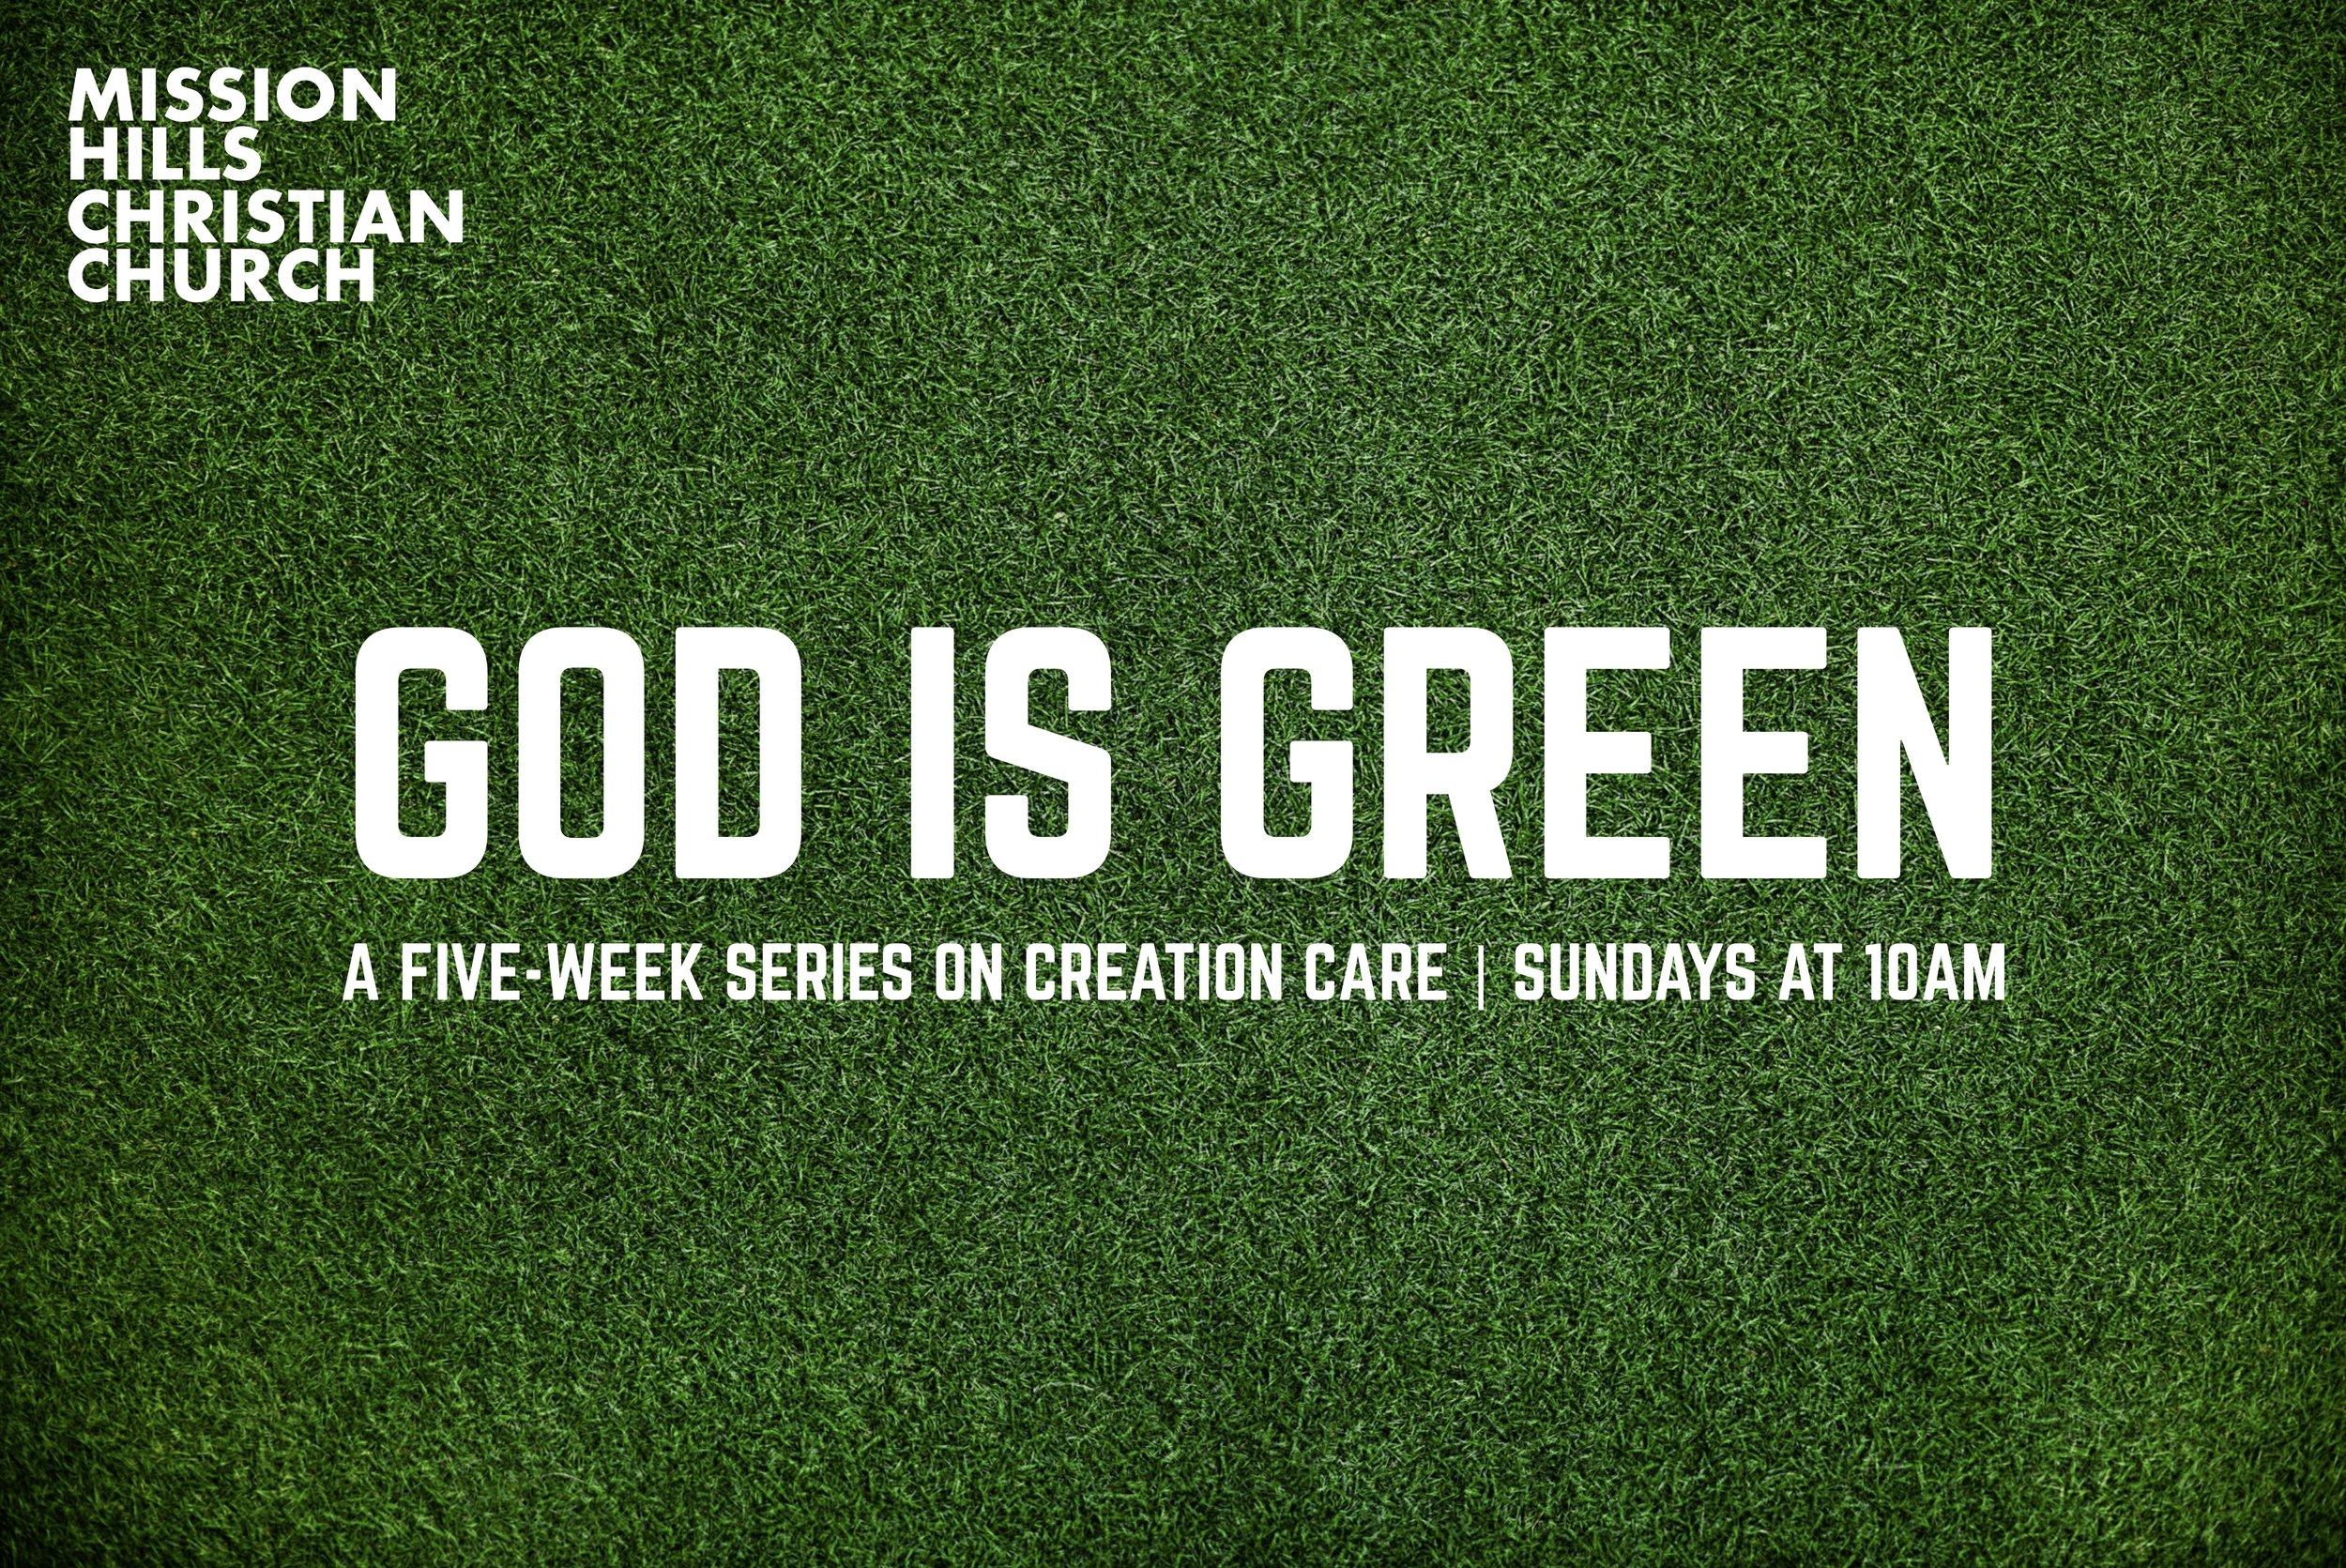 god is green mission hills christian church los angeles jpeg.jpg